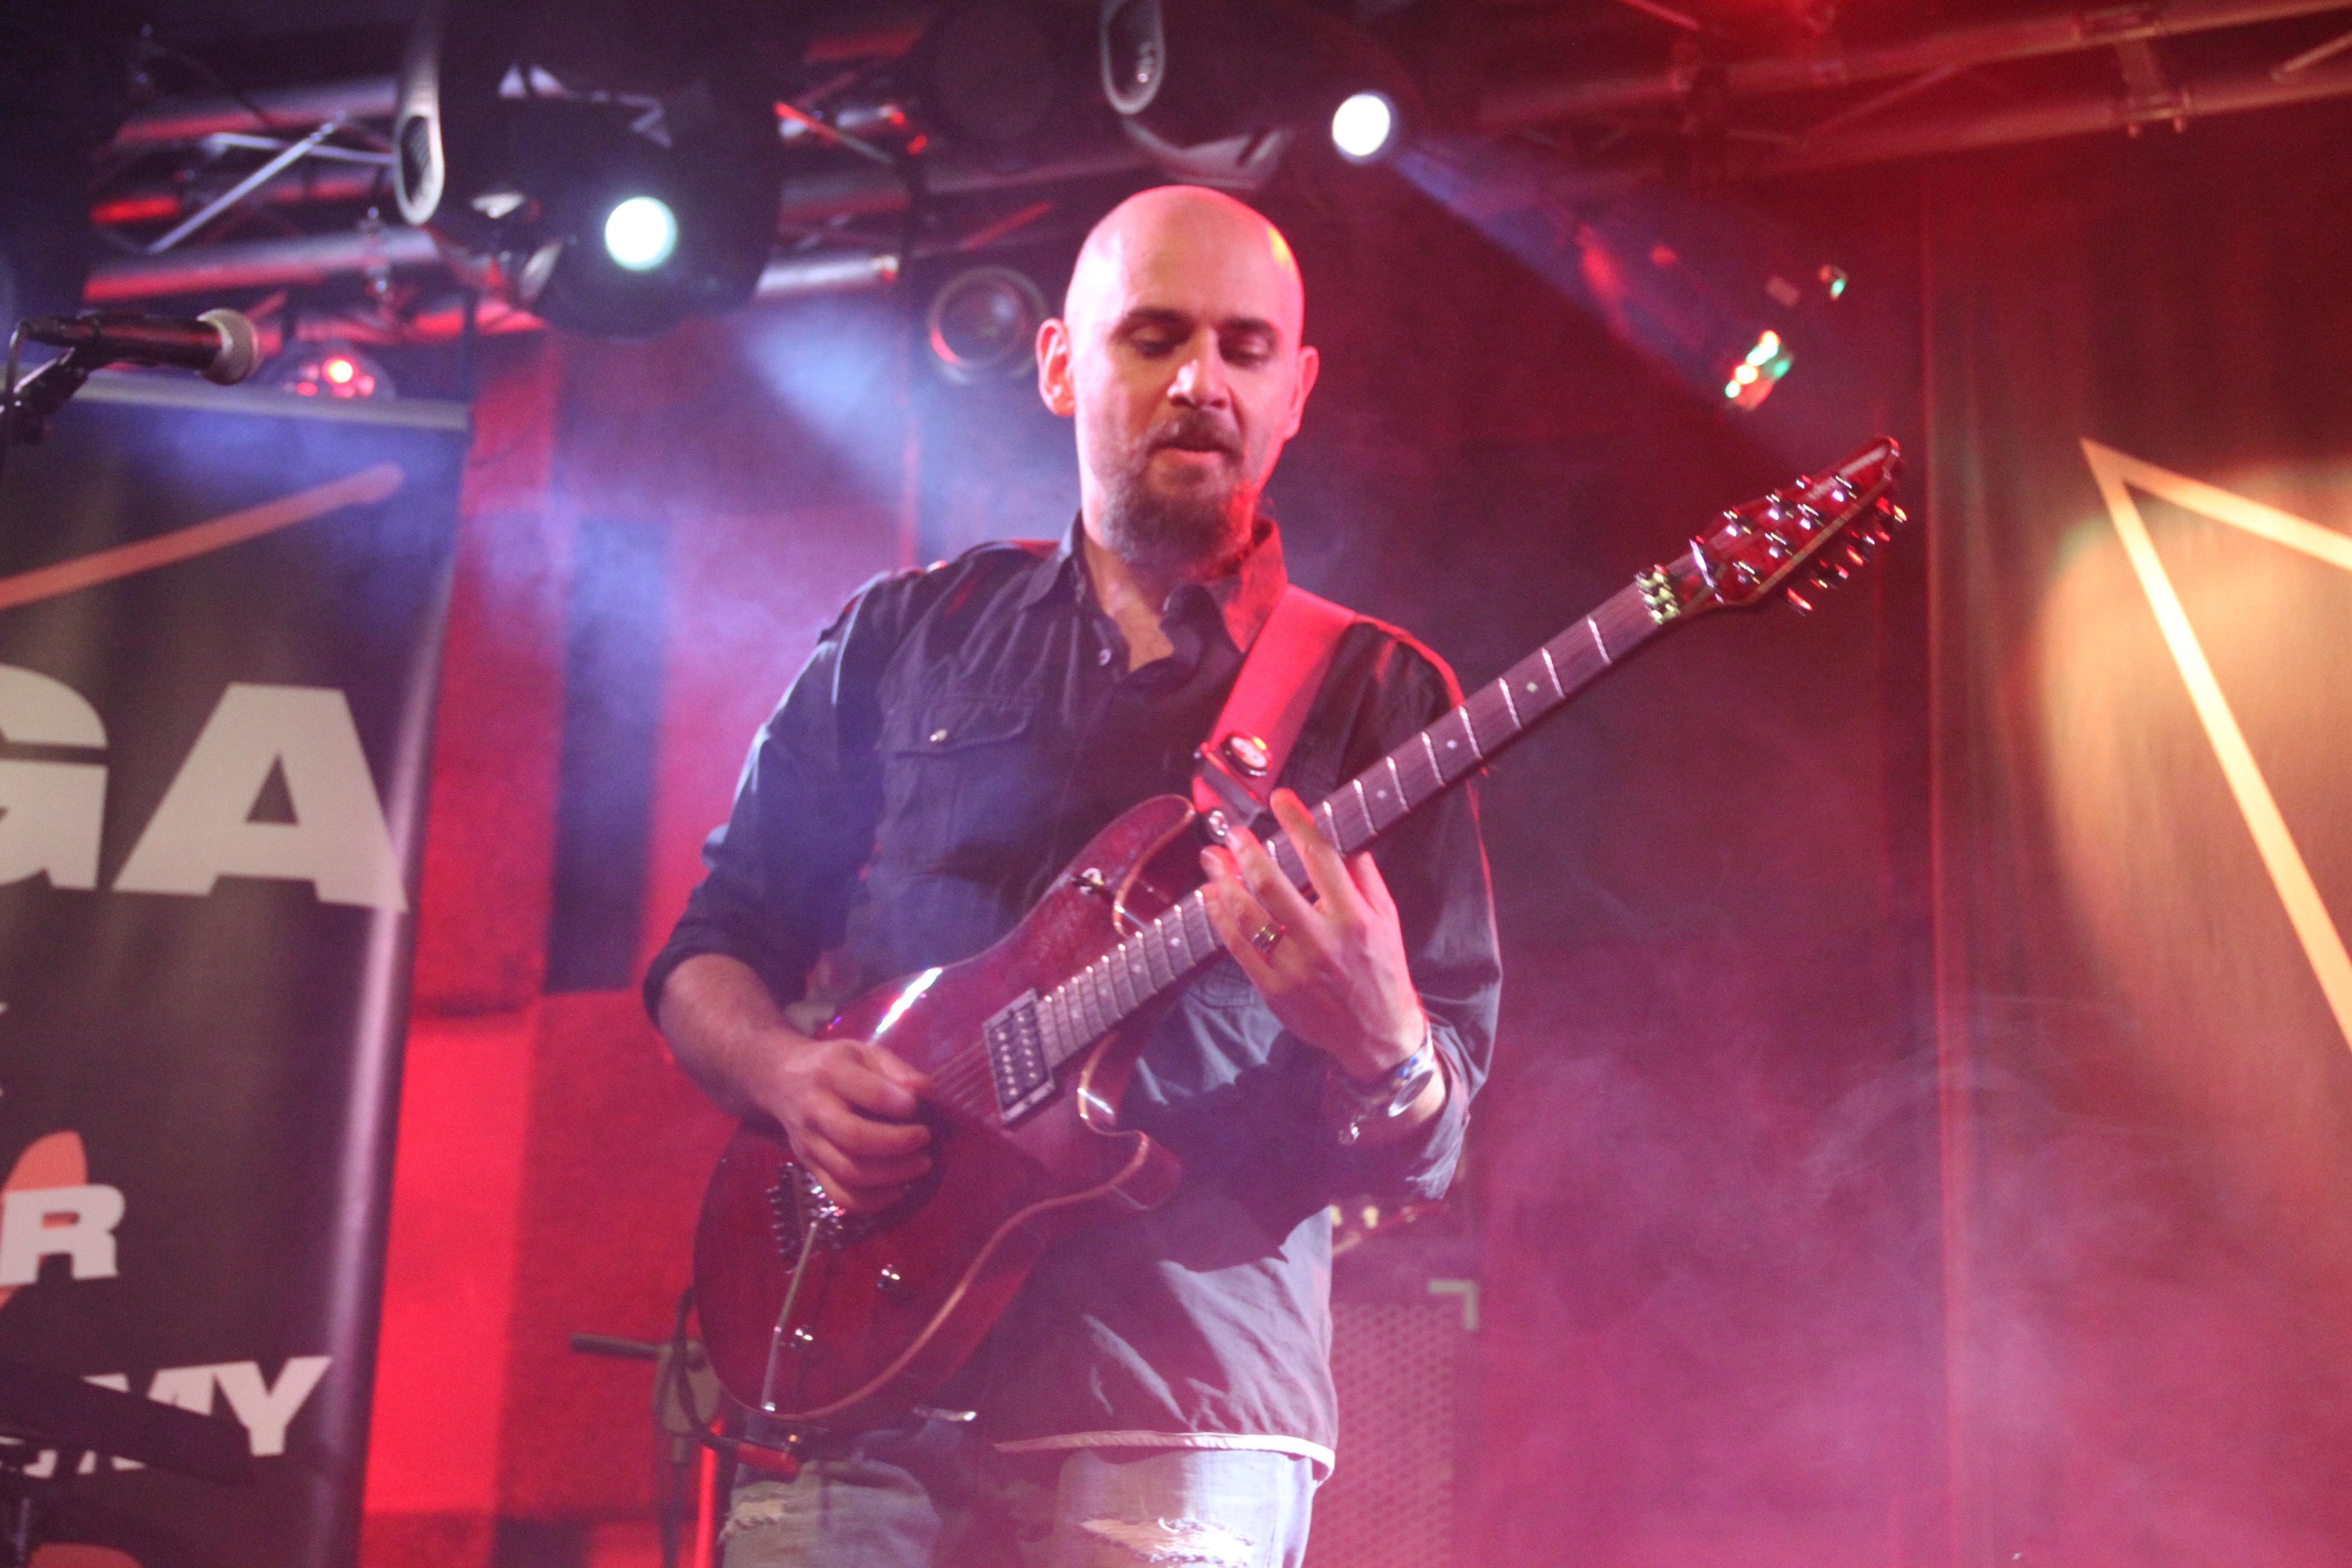 Roberto Fazari - RGA Tour 2017 - Live al Blitz per Niccolai (S. Giovanni alla Vena - PI)